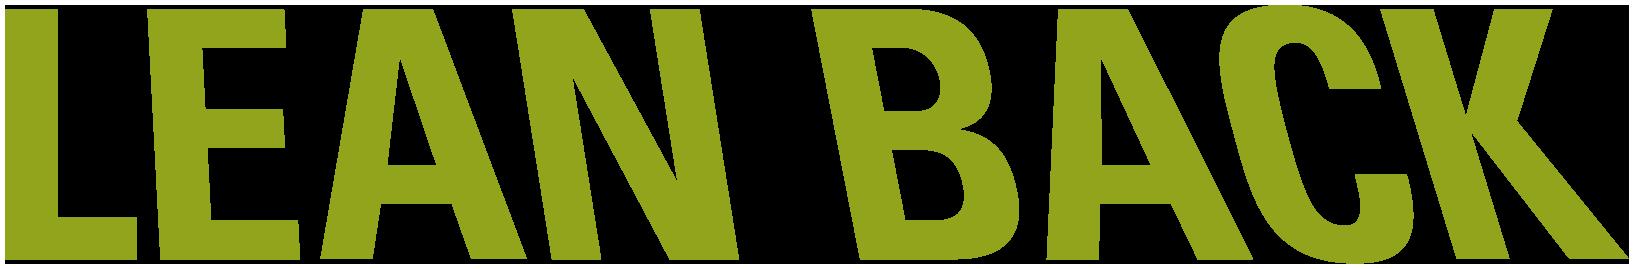 h1-leanback